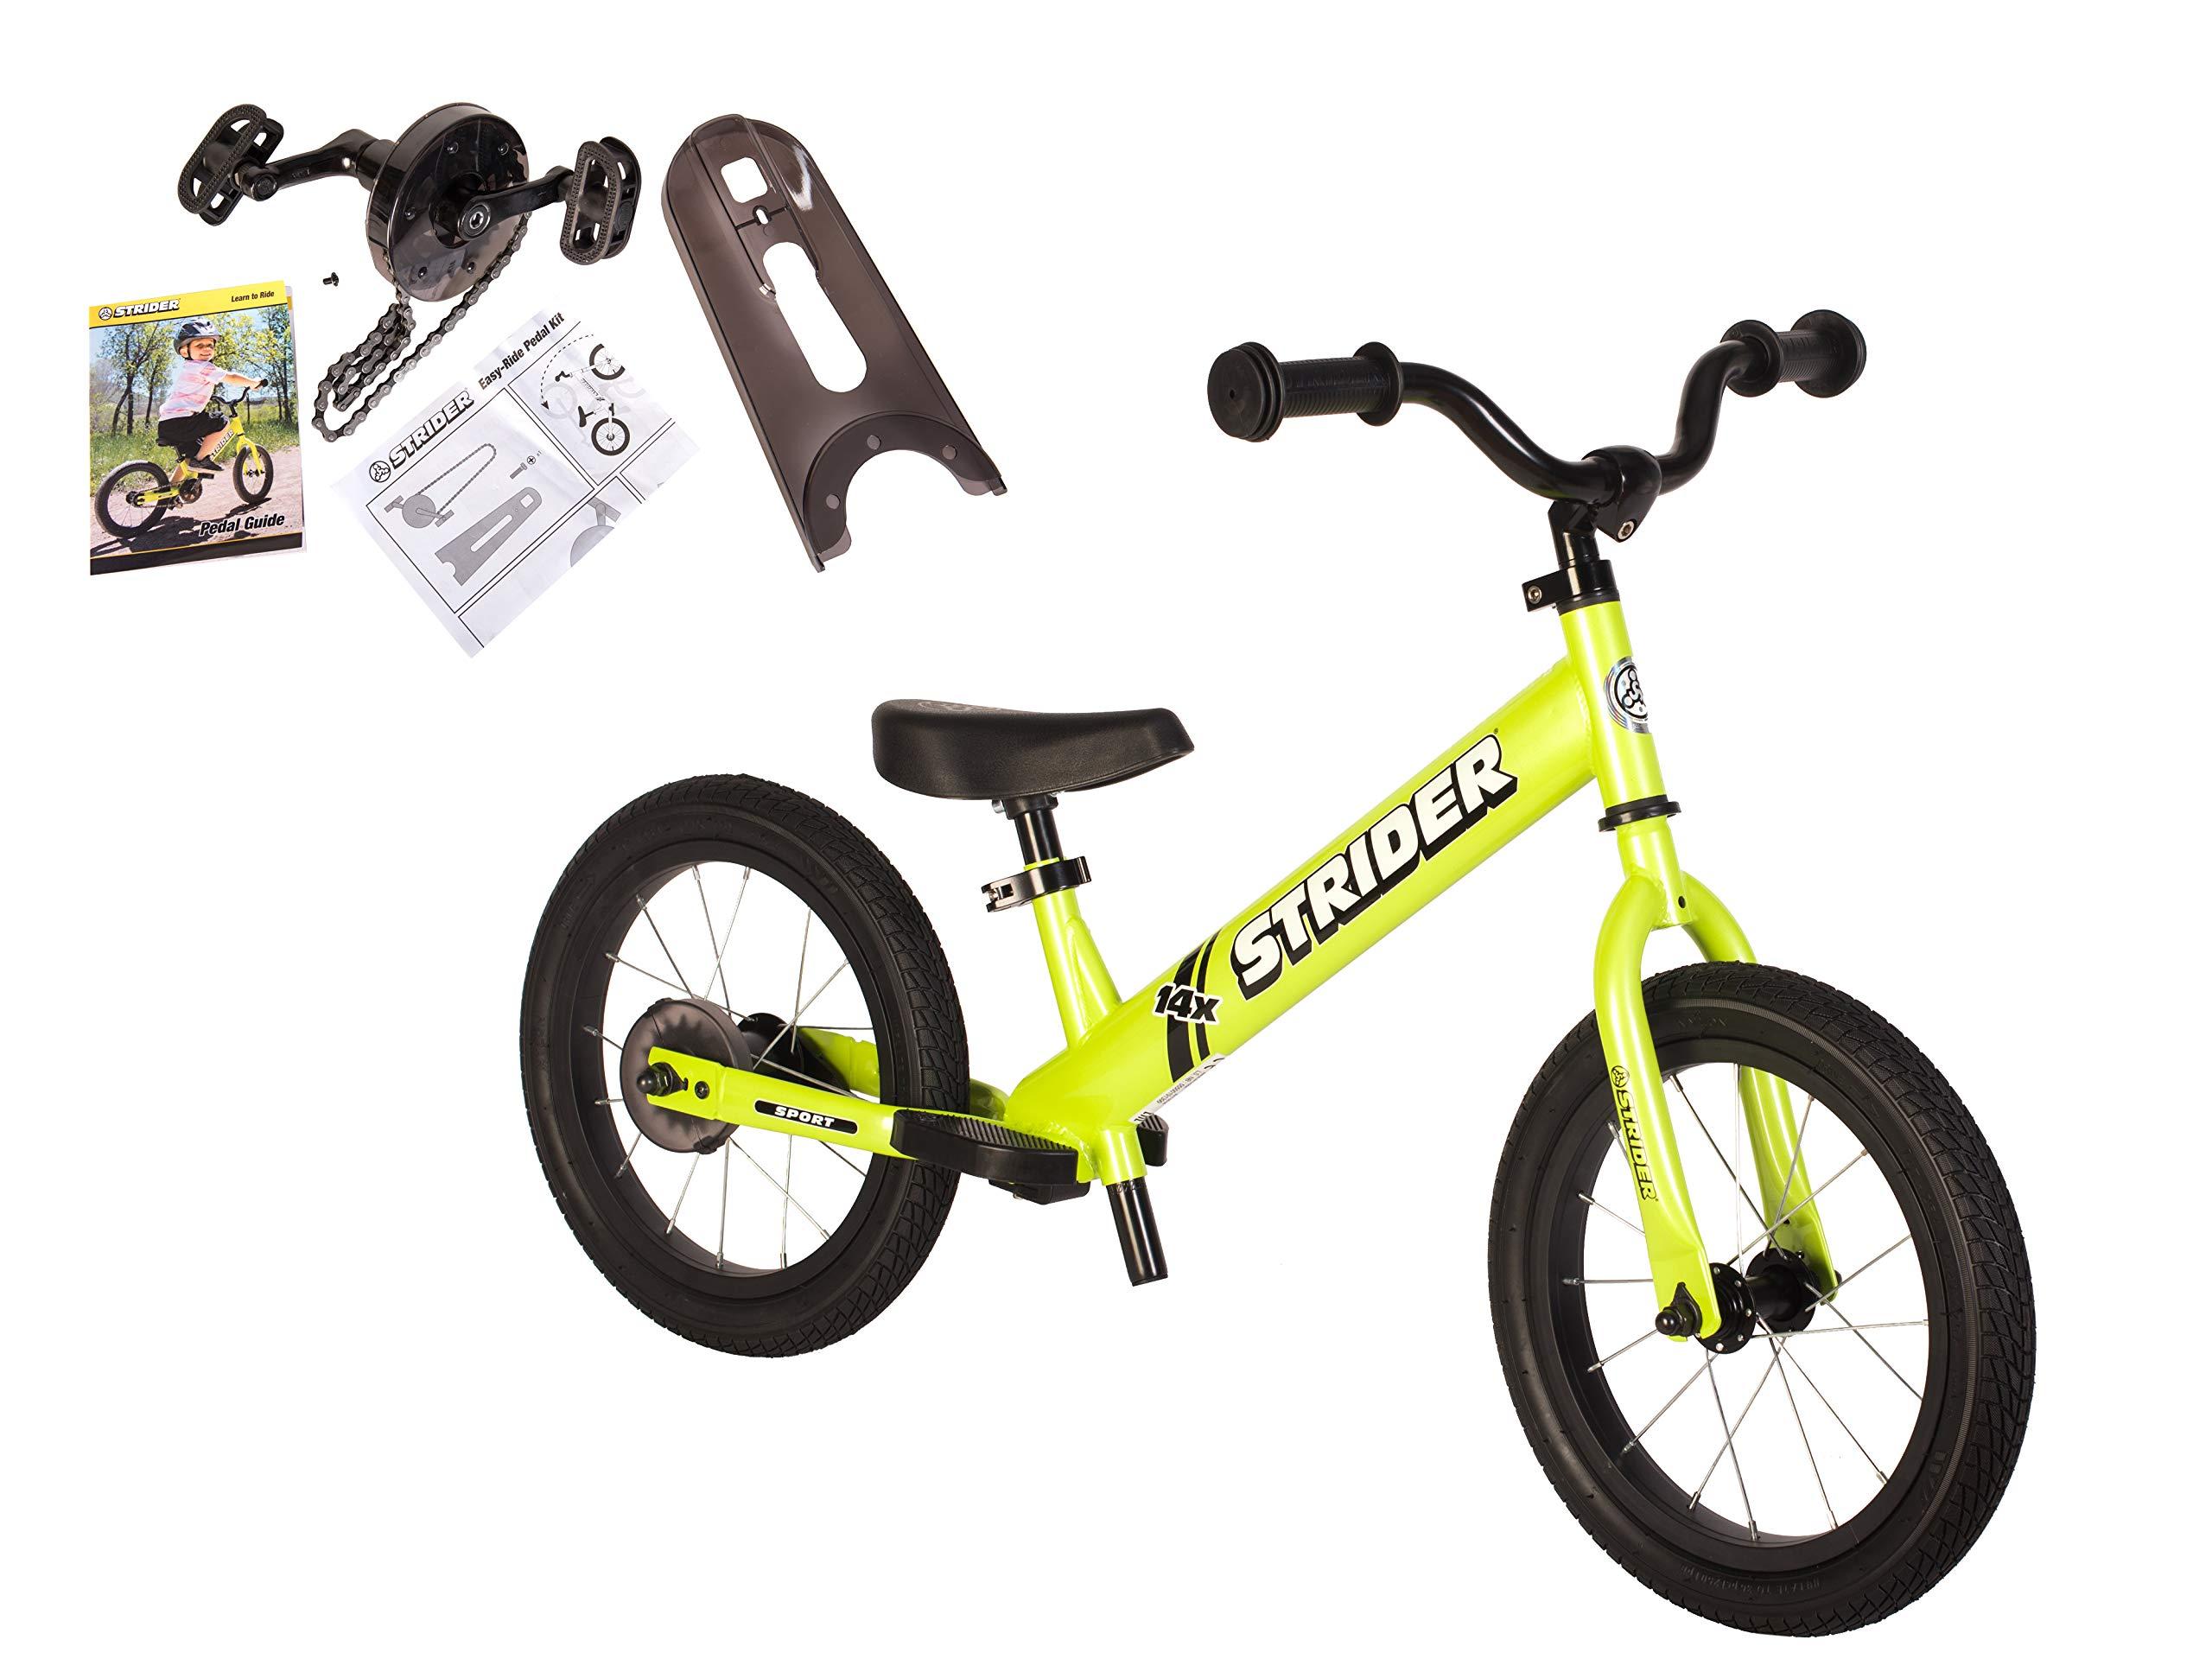 Strider - 14X 2-in-1 Balance to Pedal Bike Kit, Fantastic Green